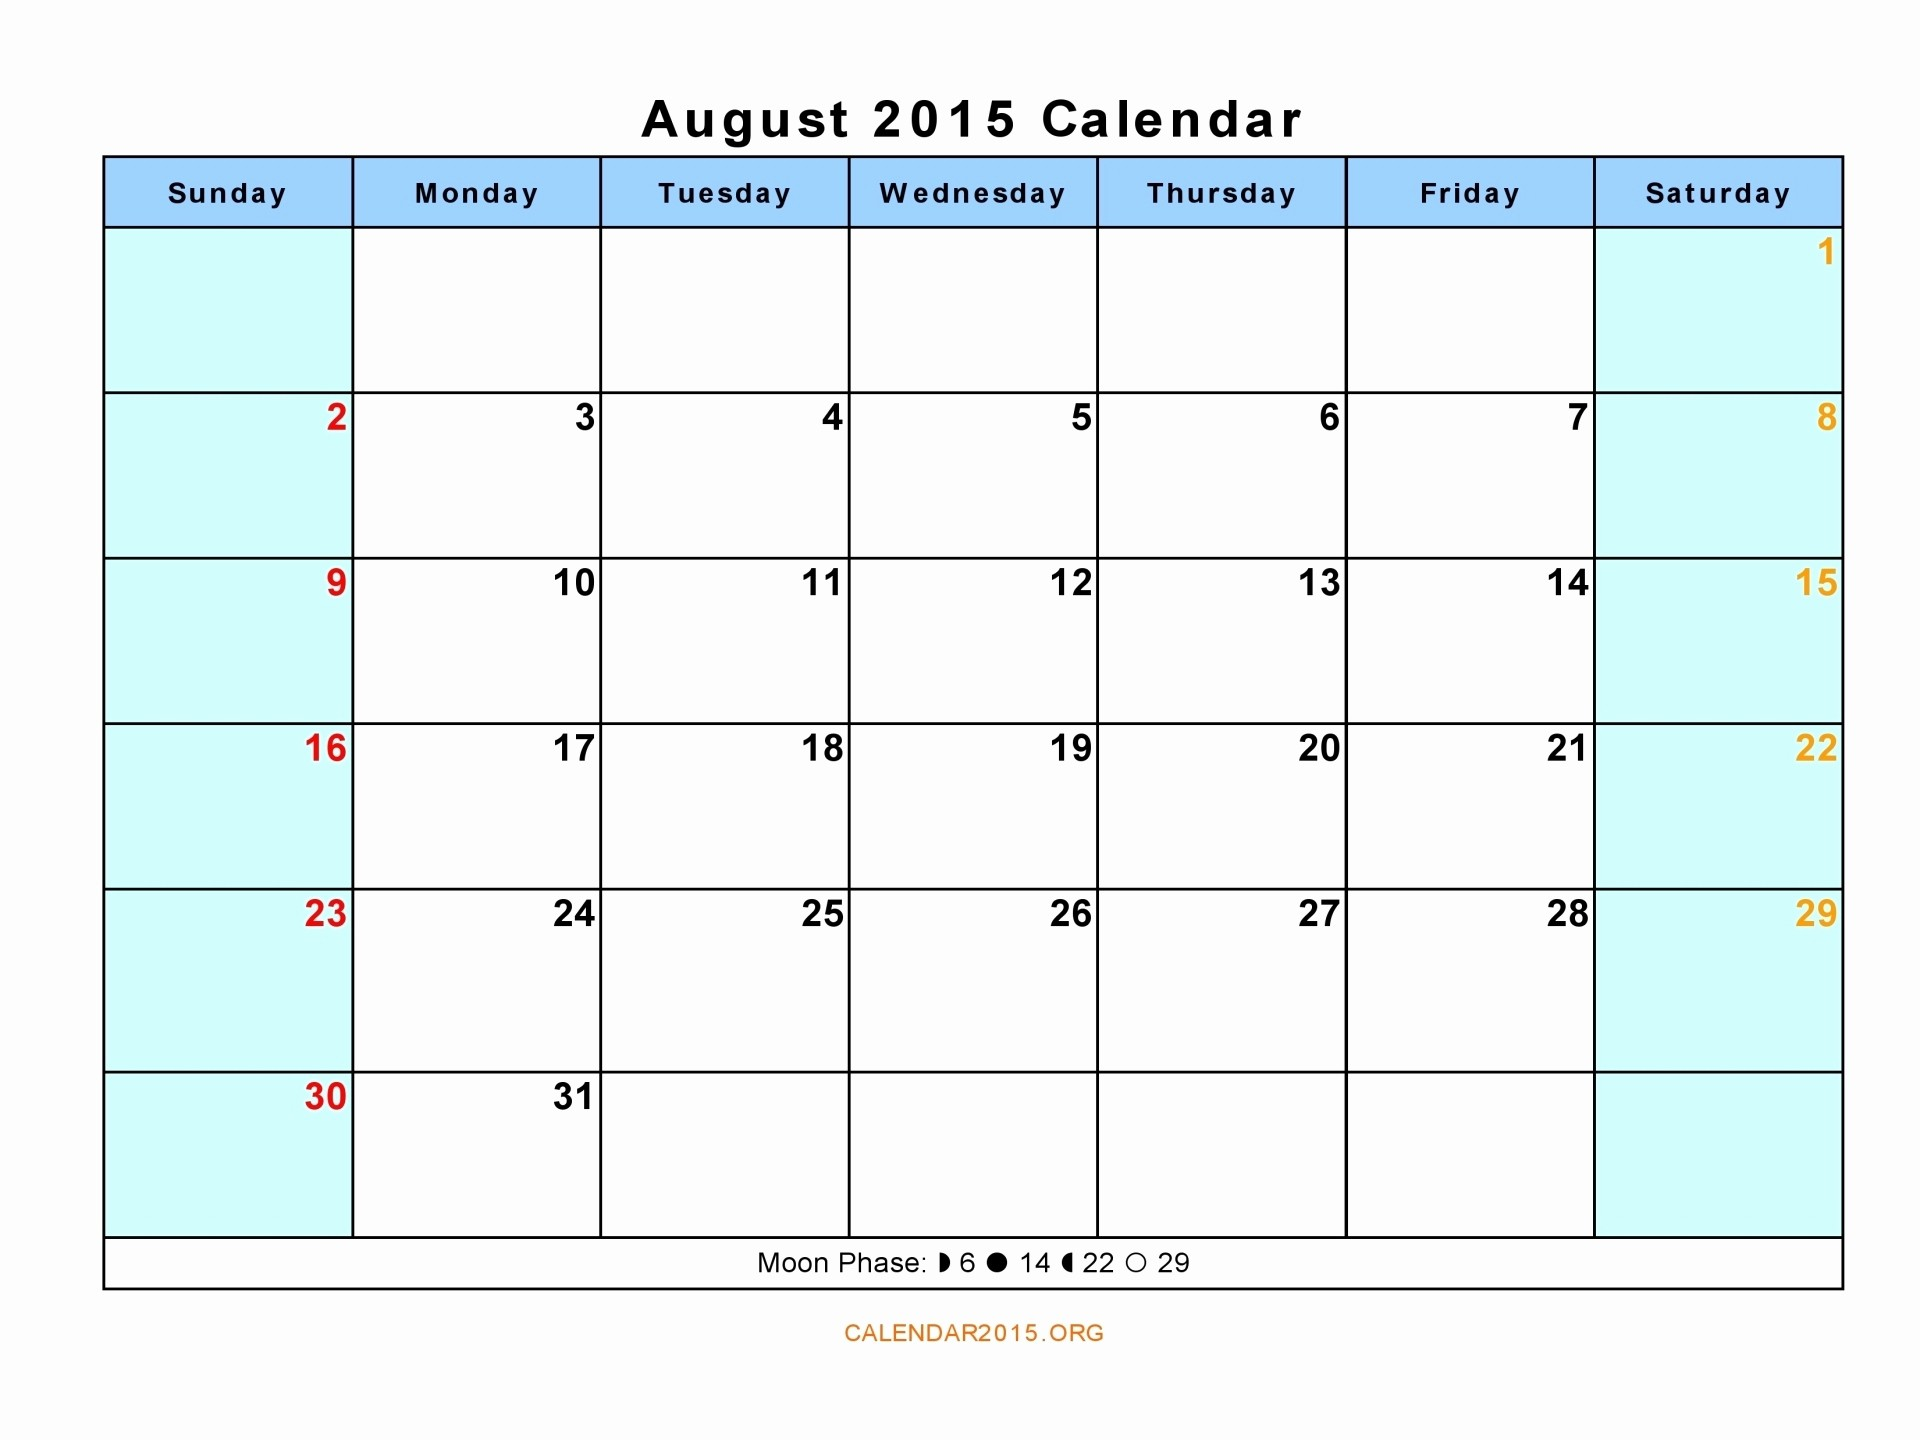 Free Monthly Calendar Templates 2015 Elegant 15 Calendar Templates 2015 April 2015 Calendar